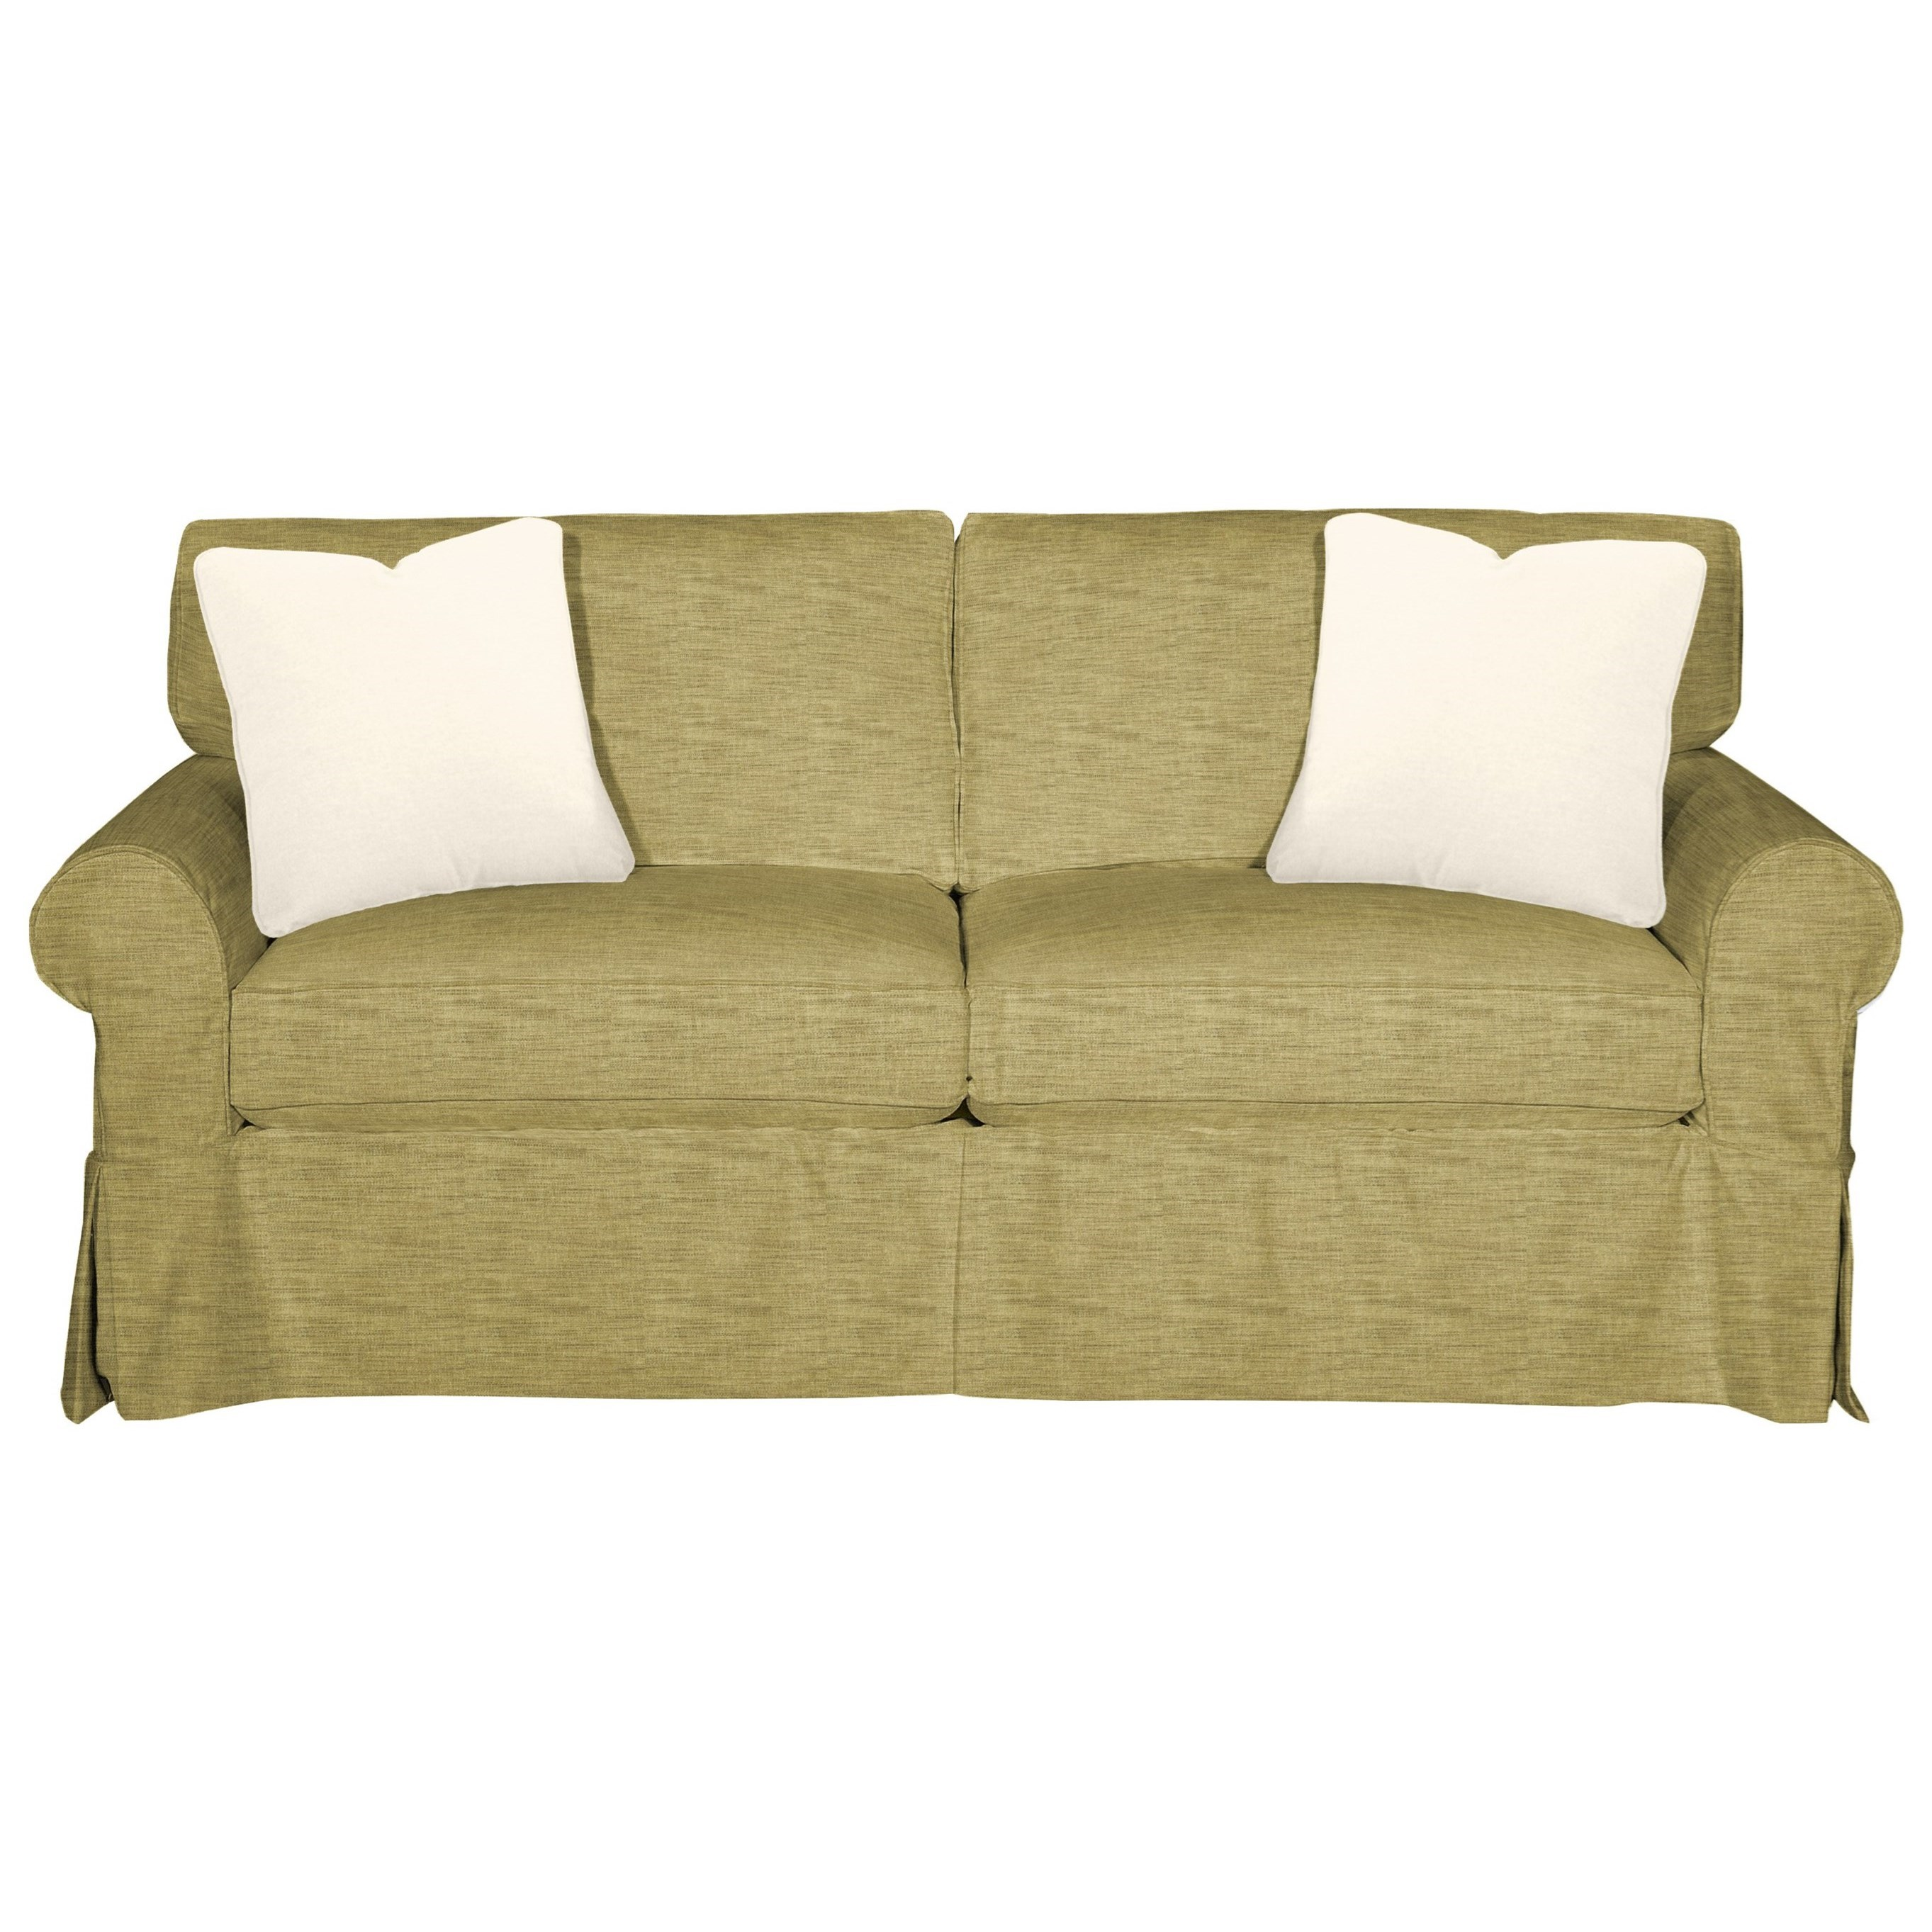 9228 Sleeper Sofa w/ Innerspring Mattress by Craftmaster at Jacksonville Furniture Mart